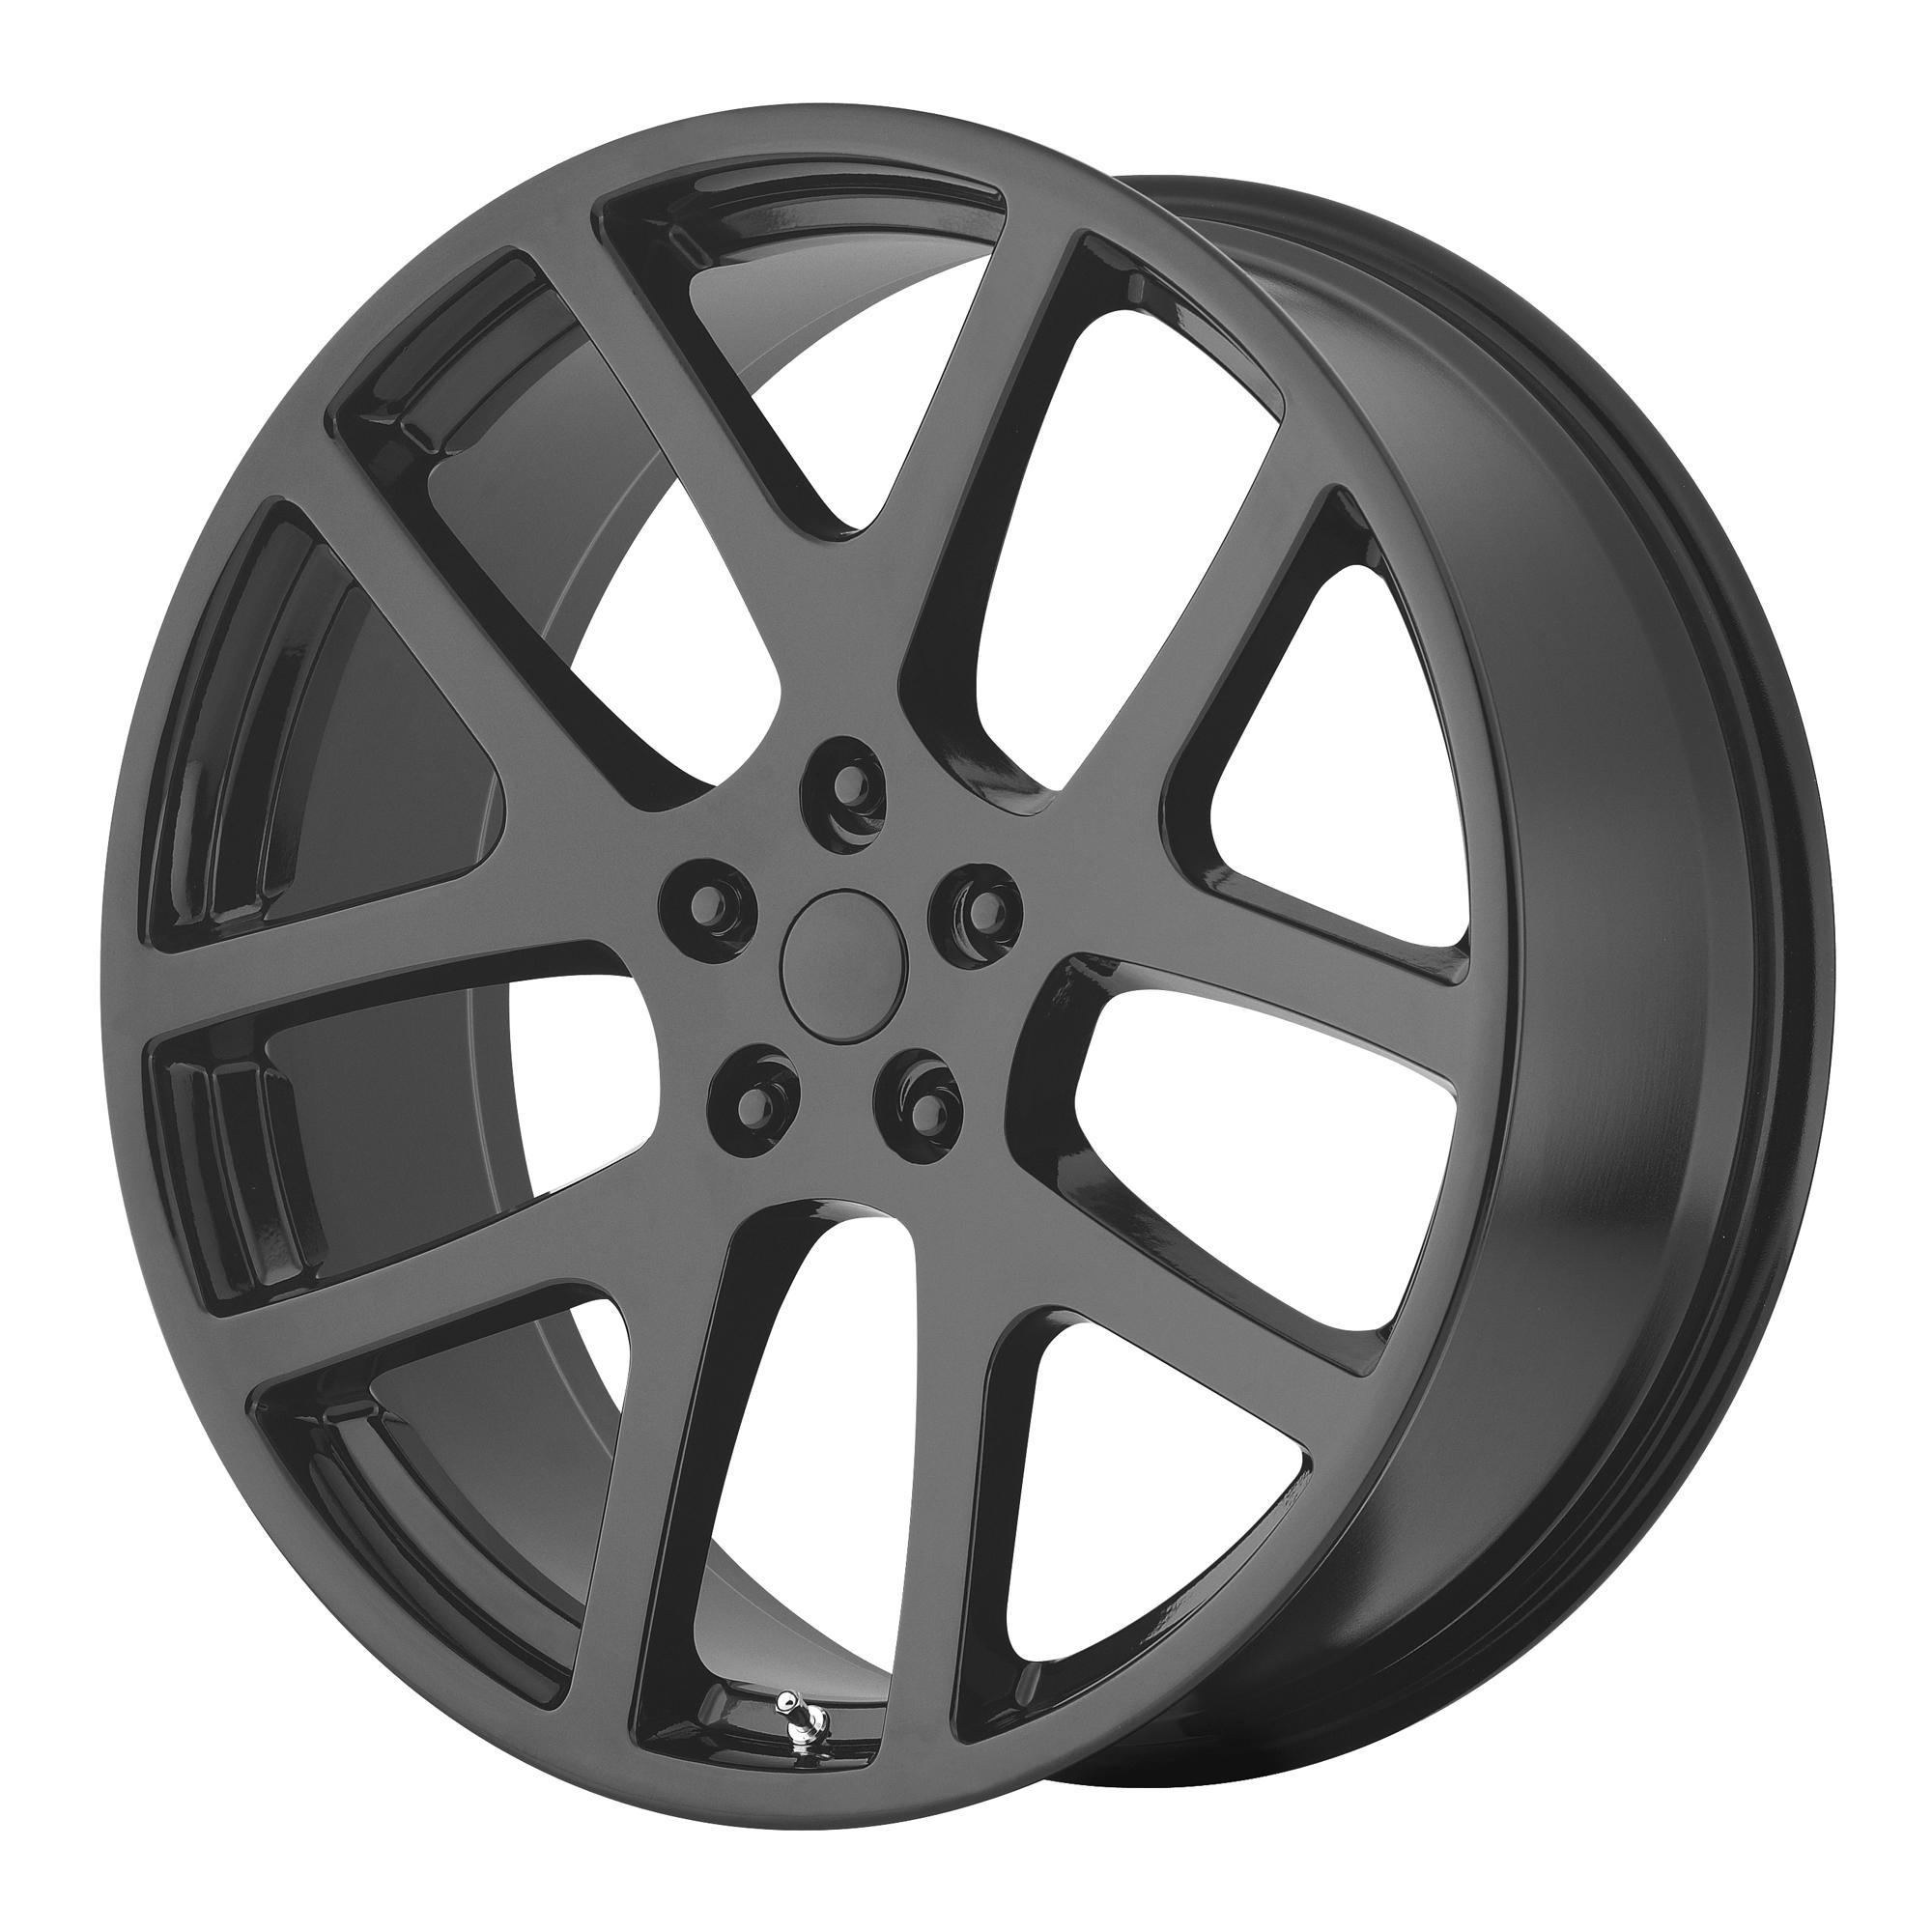 OE Creations Replica Wheels OE Creations PR149 Matte Black